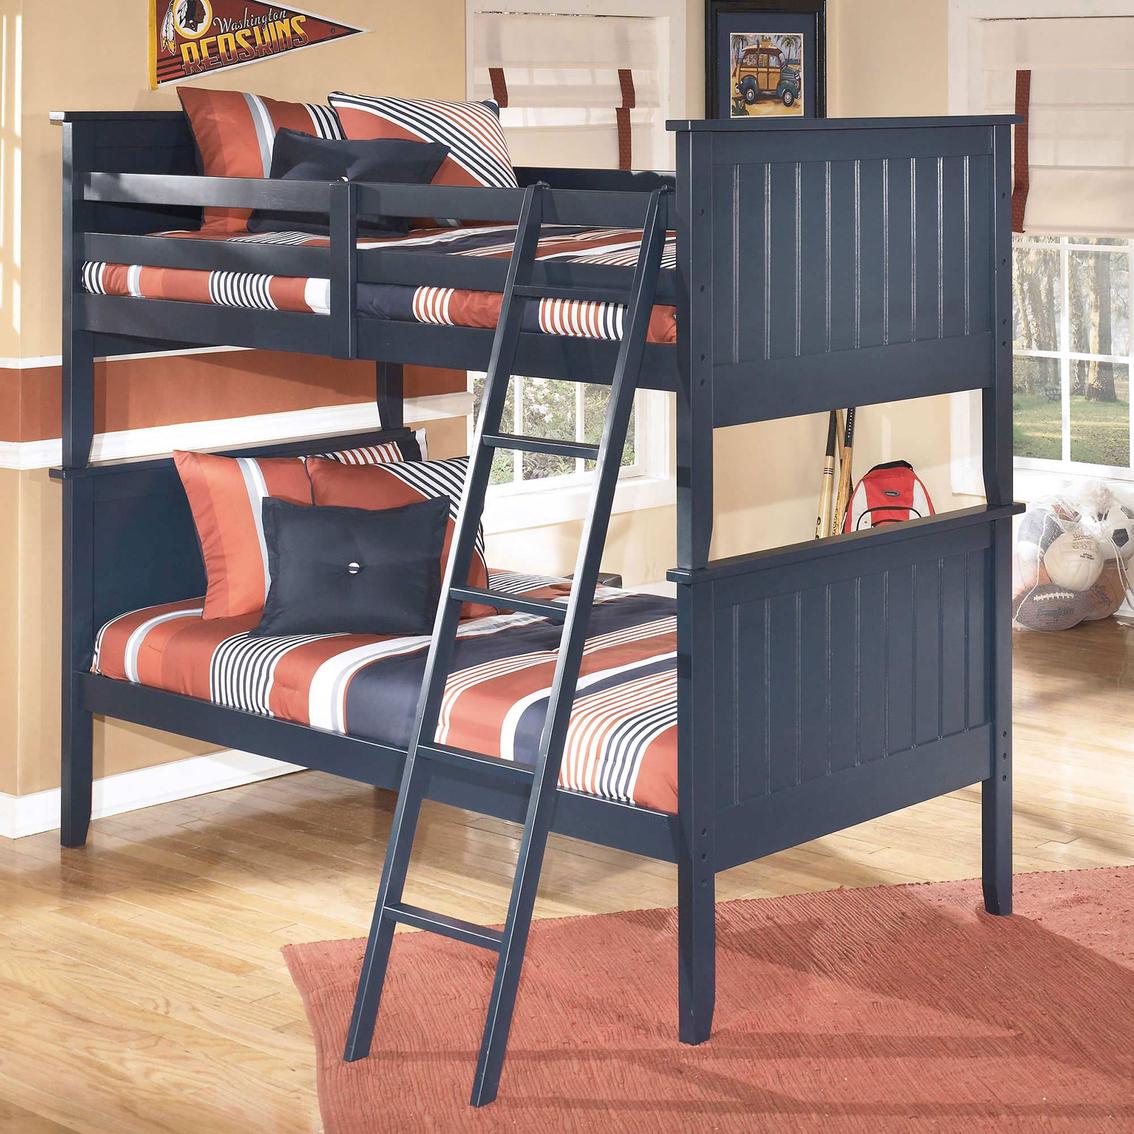 ashley leo twin bunk bed beds home appliances shop the exchange